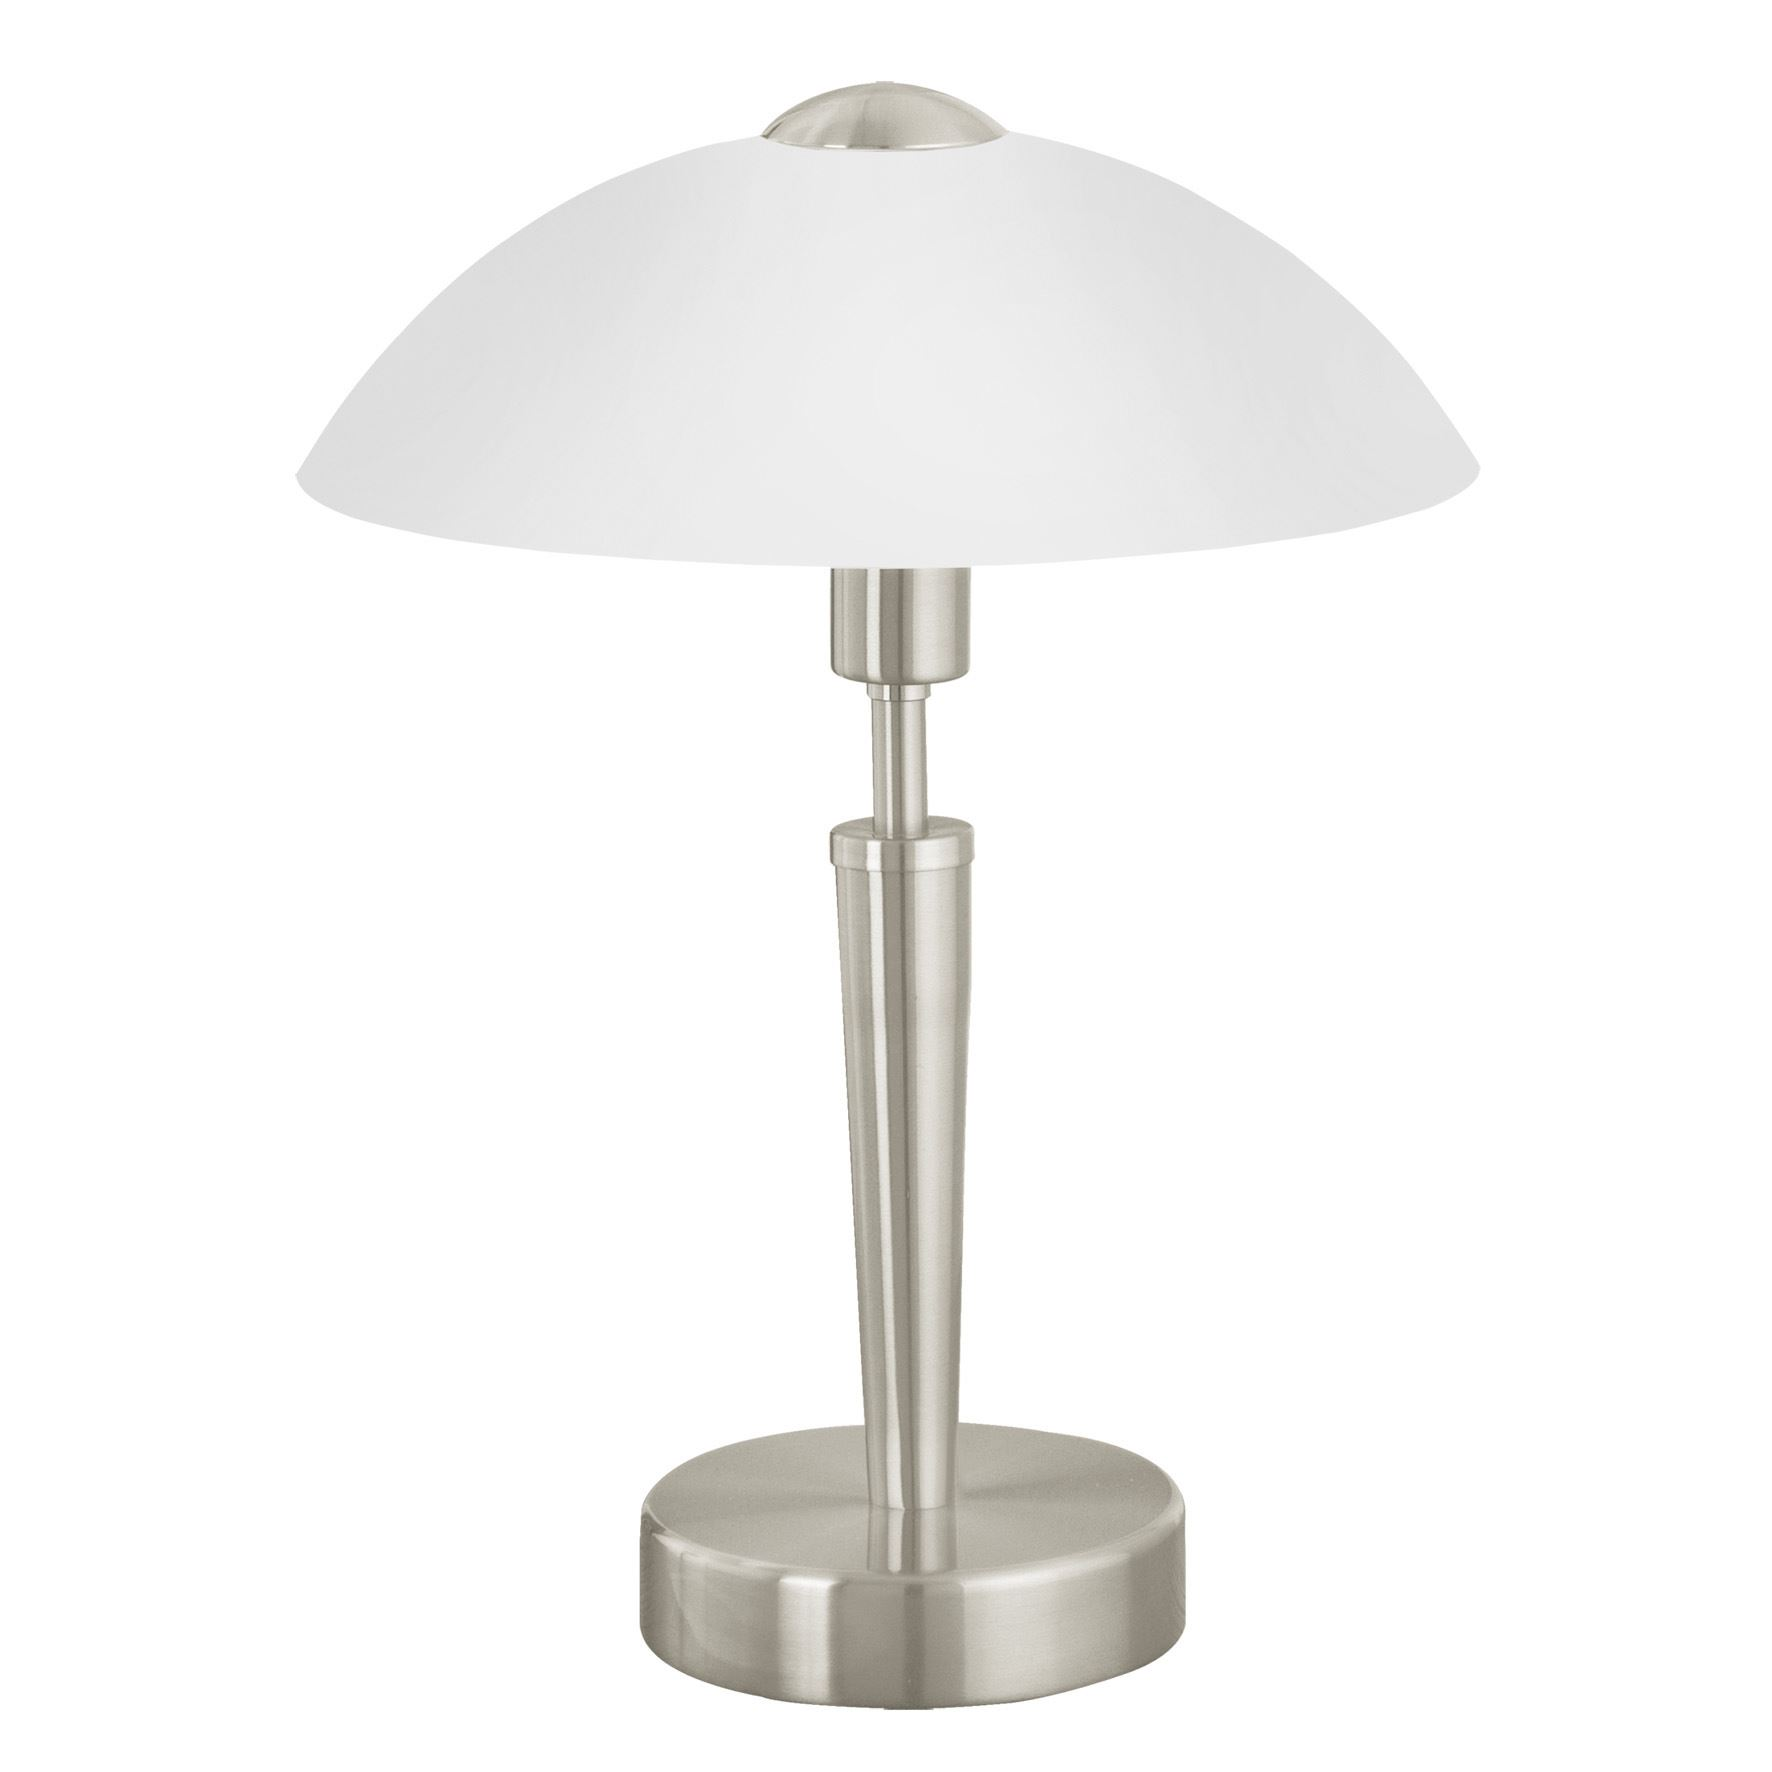 Solo Modern 1 Steel Table Lamp 1 Light Glass White Shade